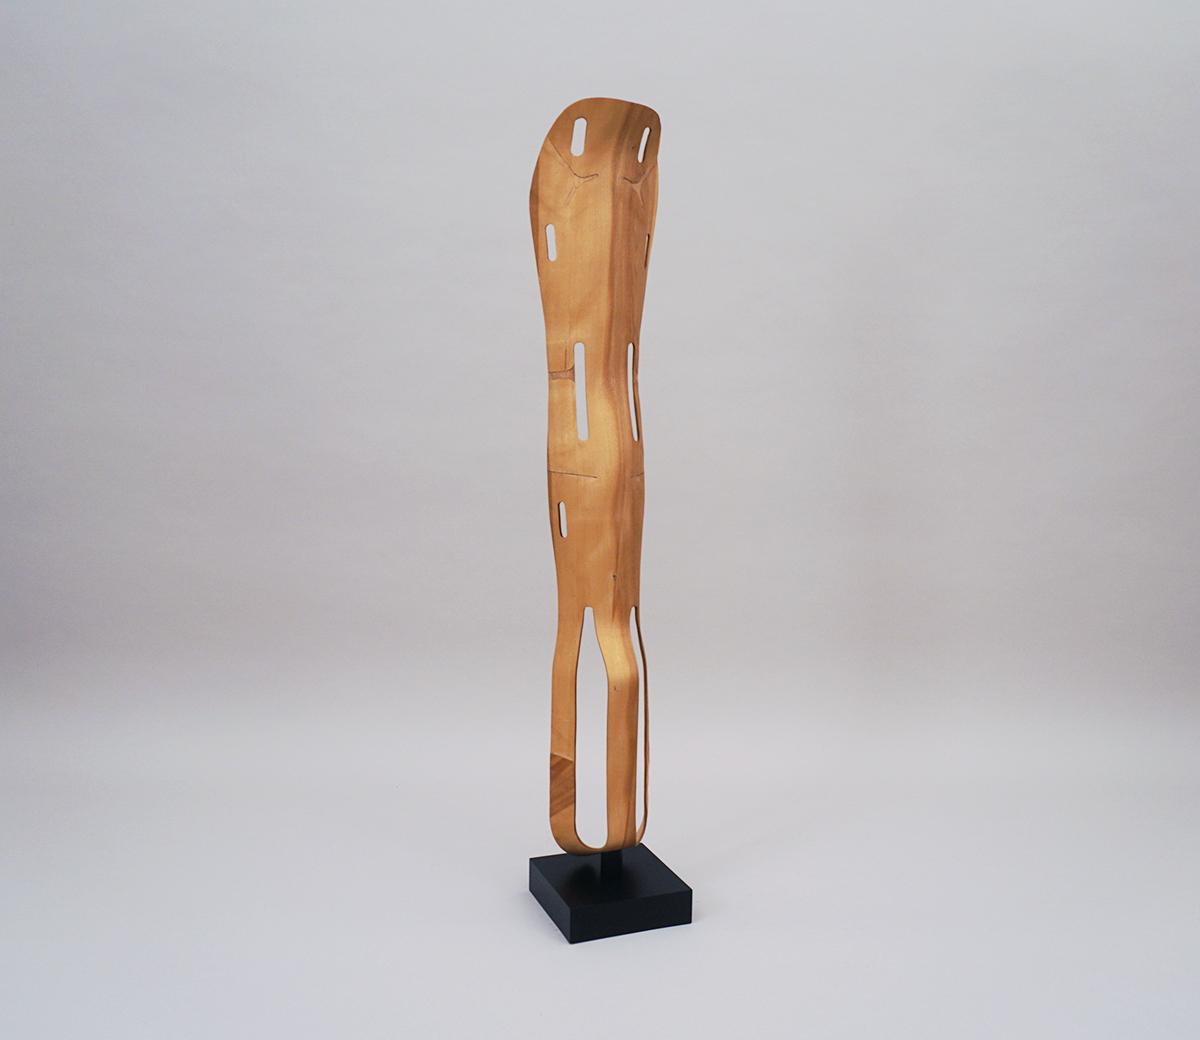 eames-leg-splint